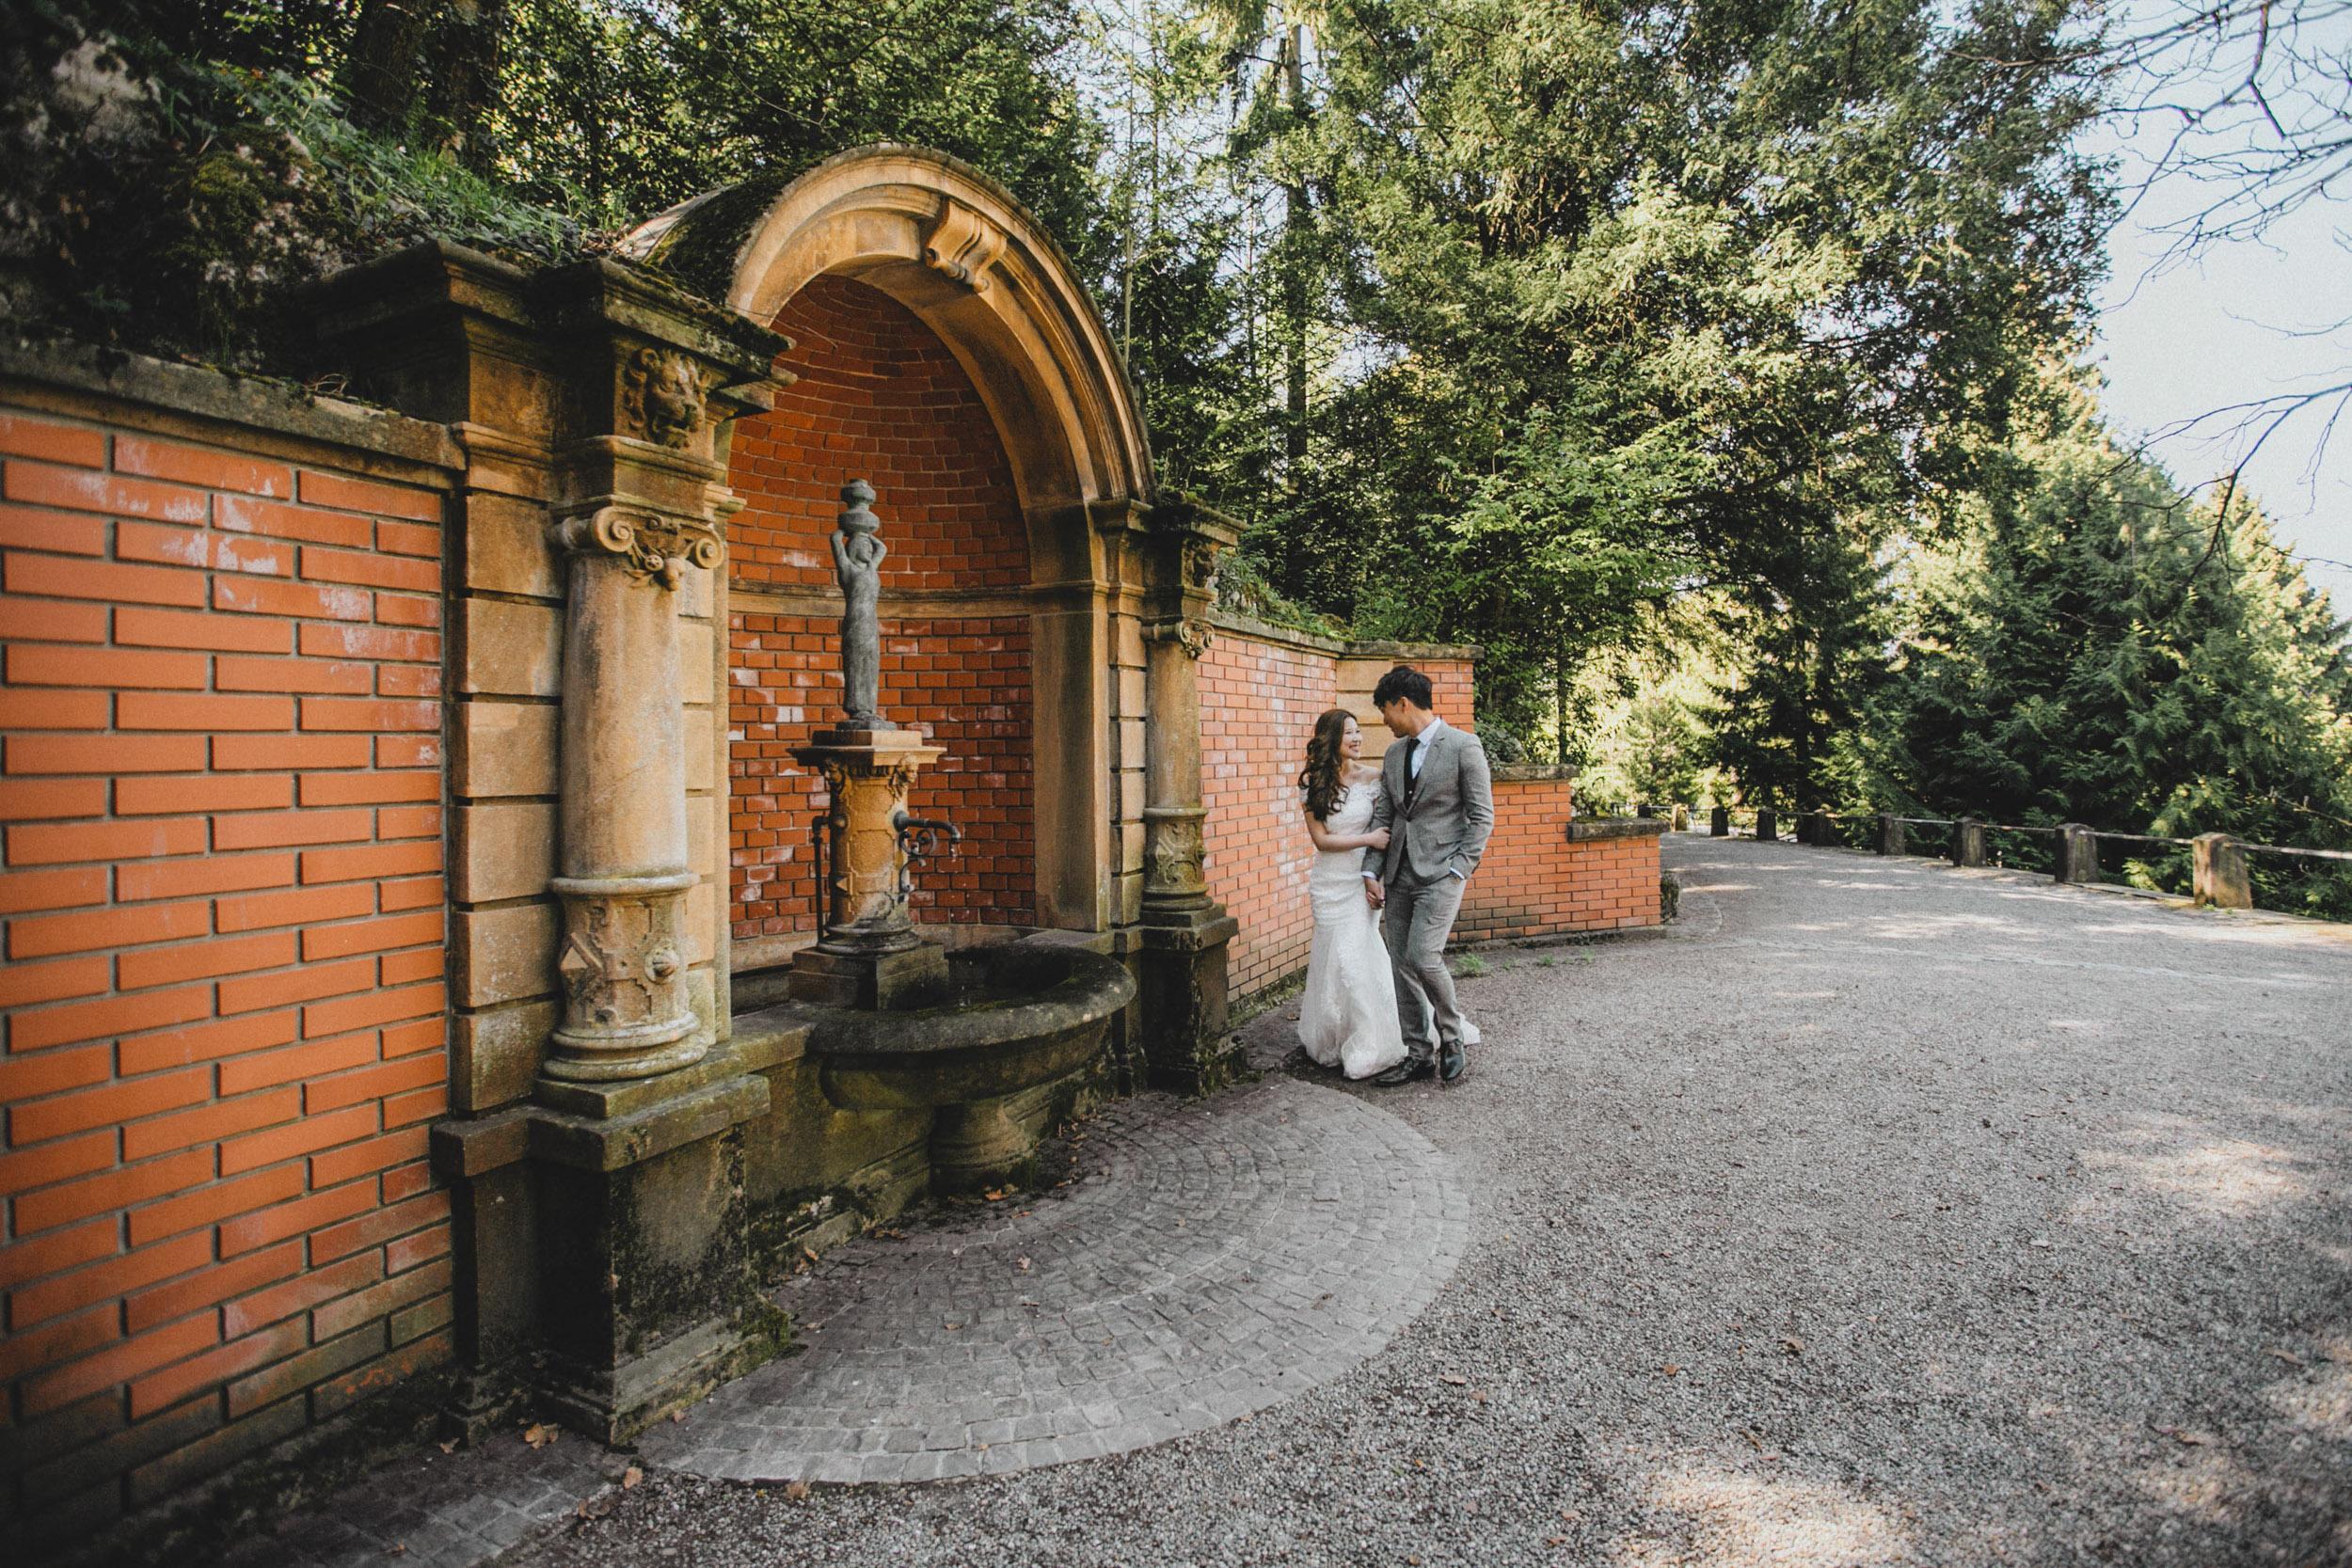 hochzeitsfotografie-schweiz_wedding-photographer-switzerland-europe_Bendik-Photography-128